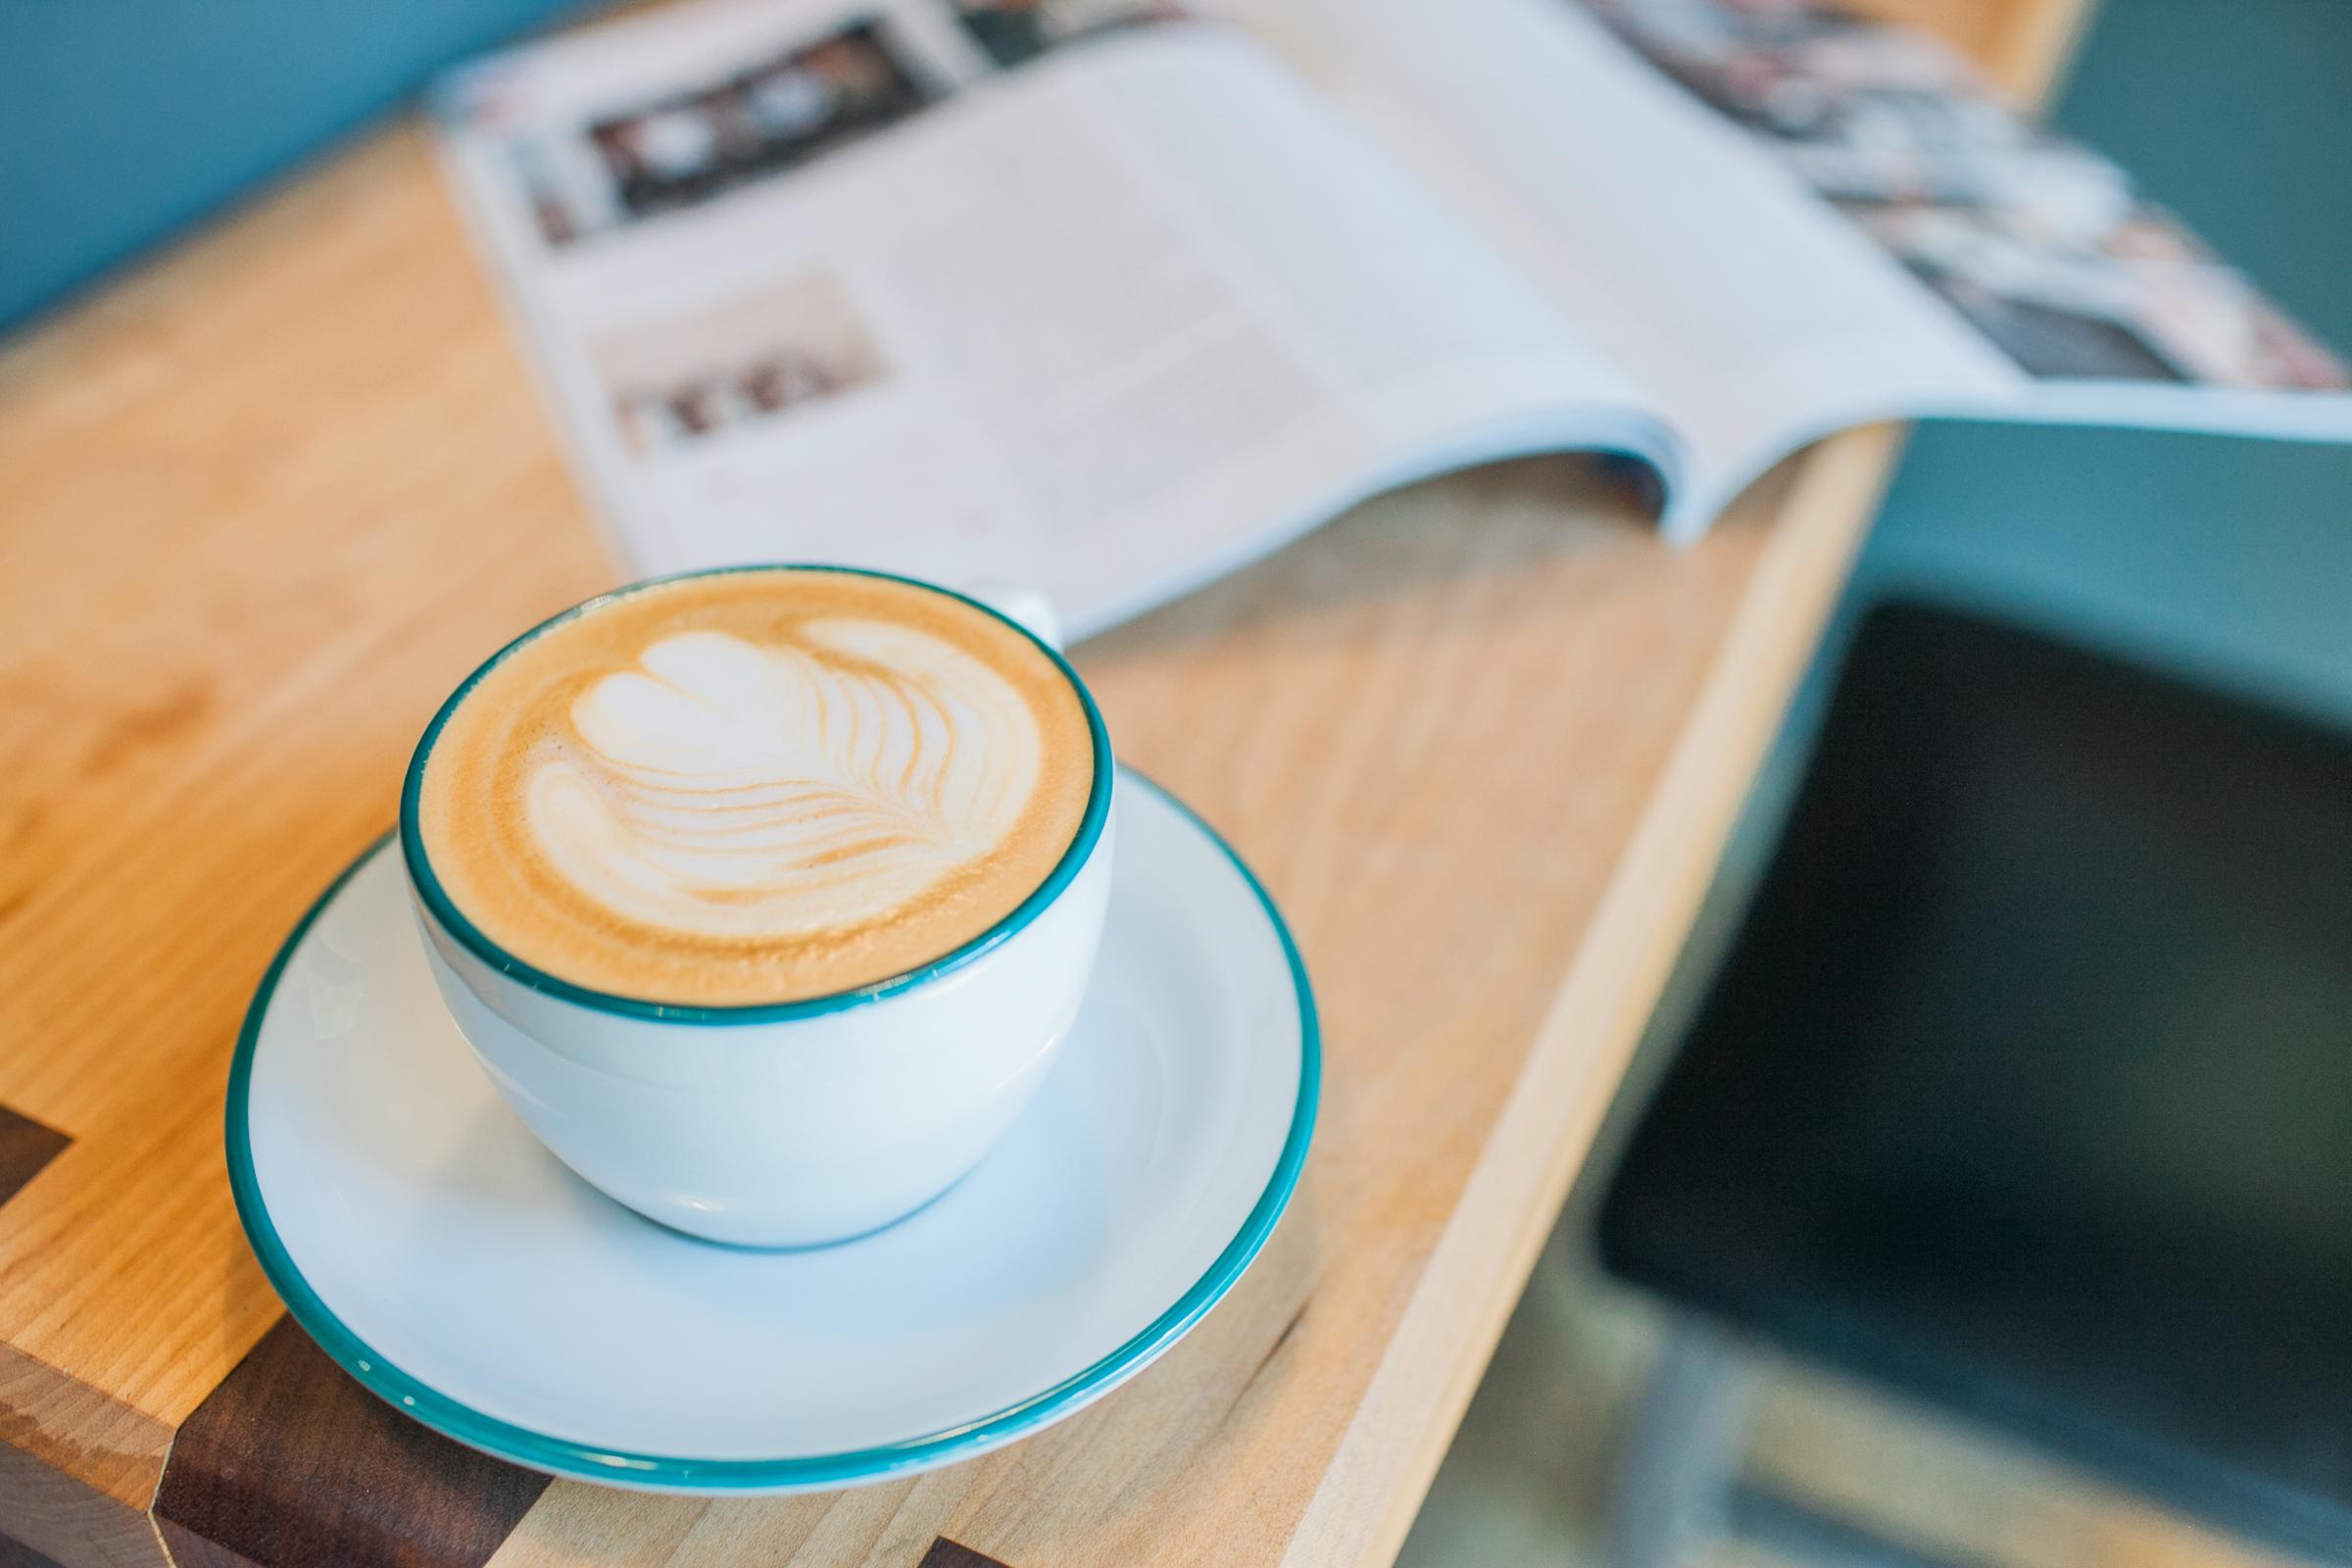 Latte art in cup